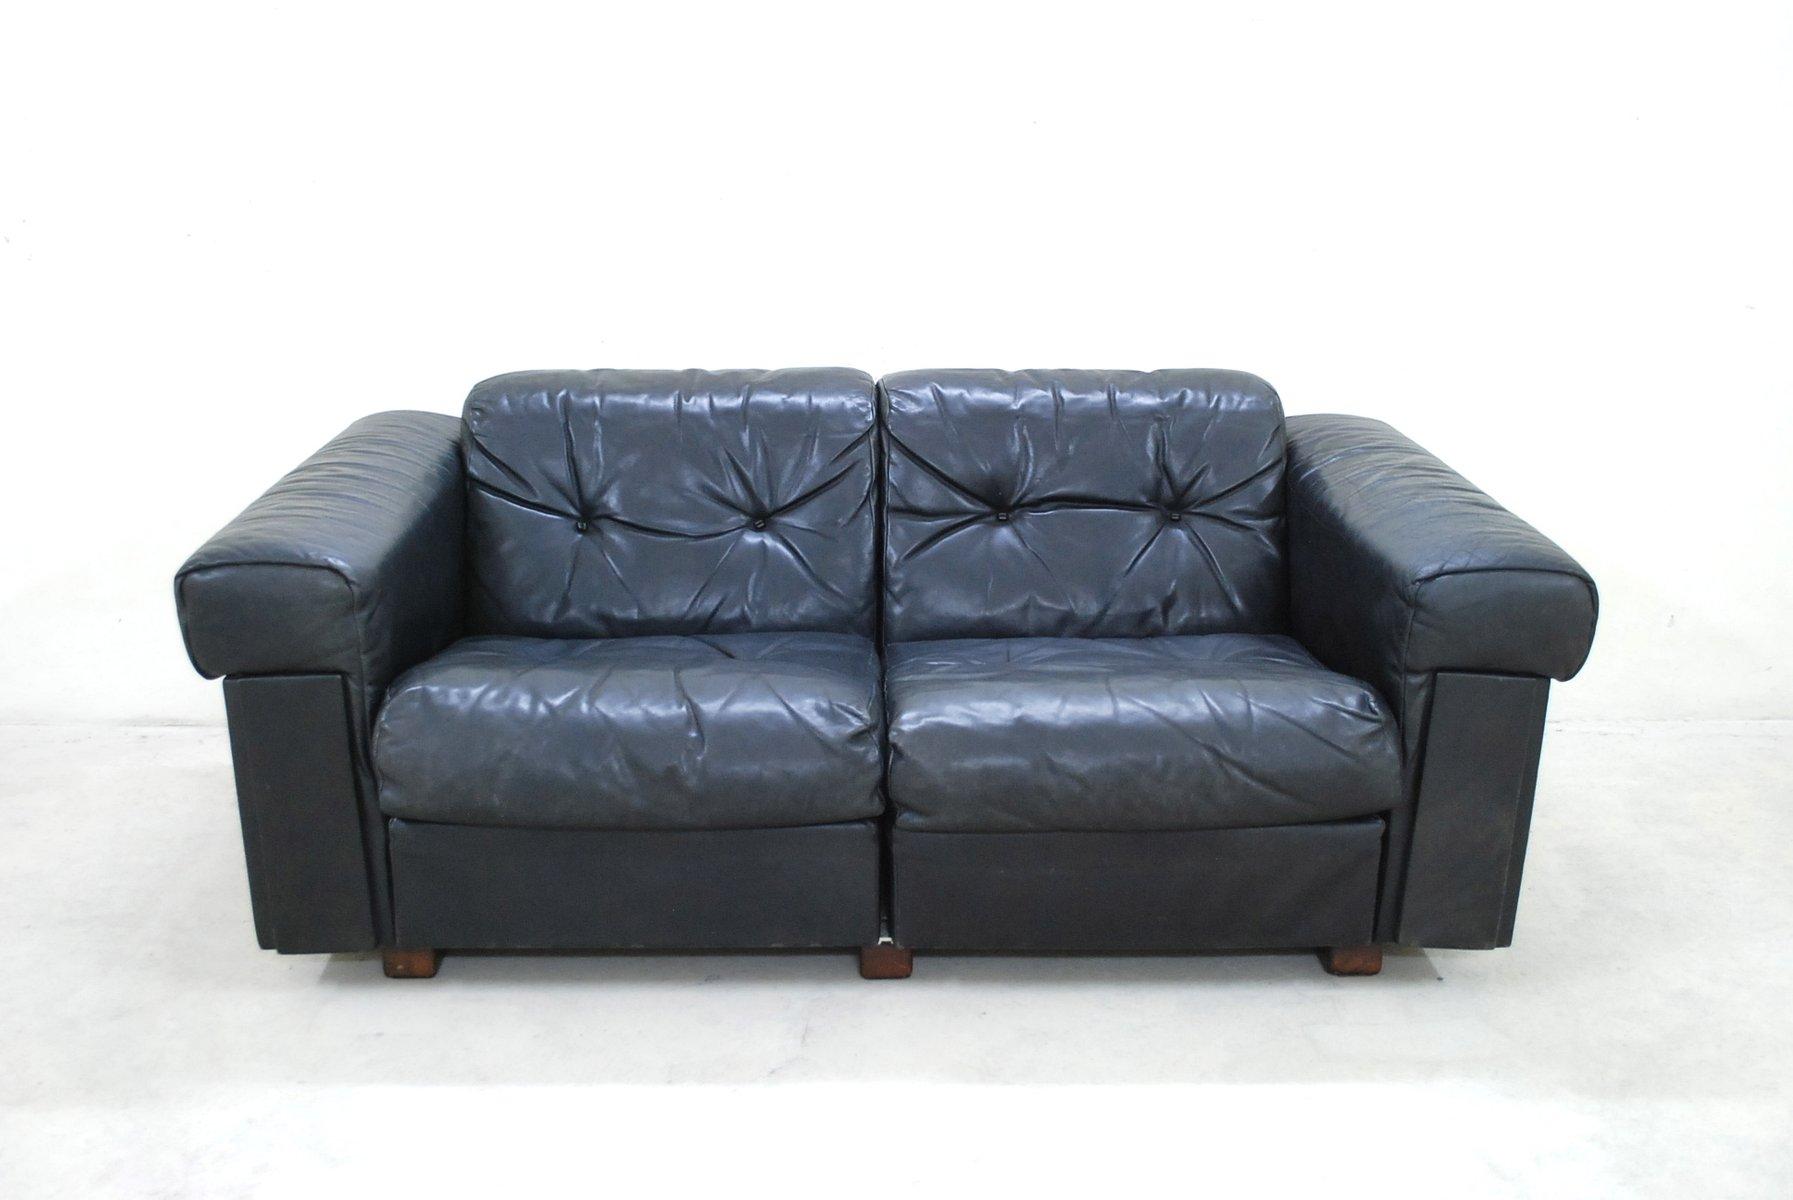 schwarzes zwei sitzer ledersofa von de sede 1970 bei. Black Bedroom Furniture Sets. Home Design Ideas